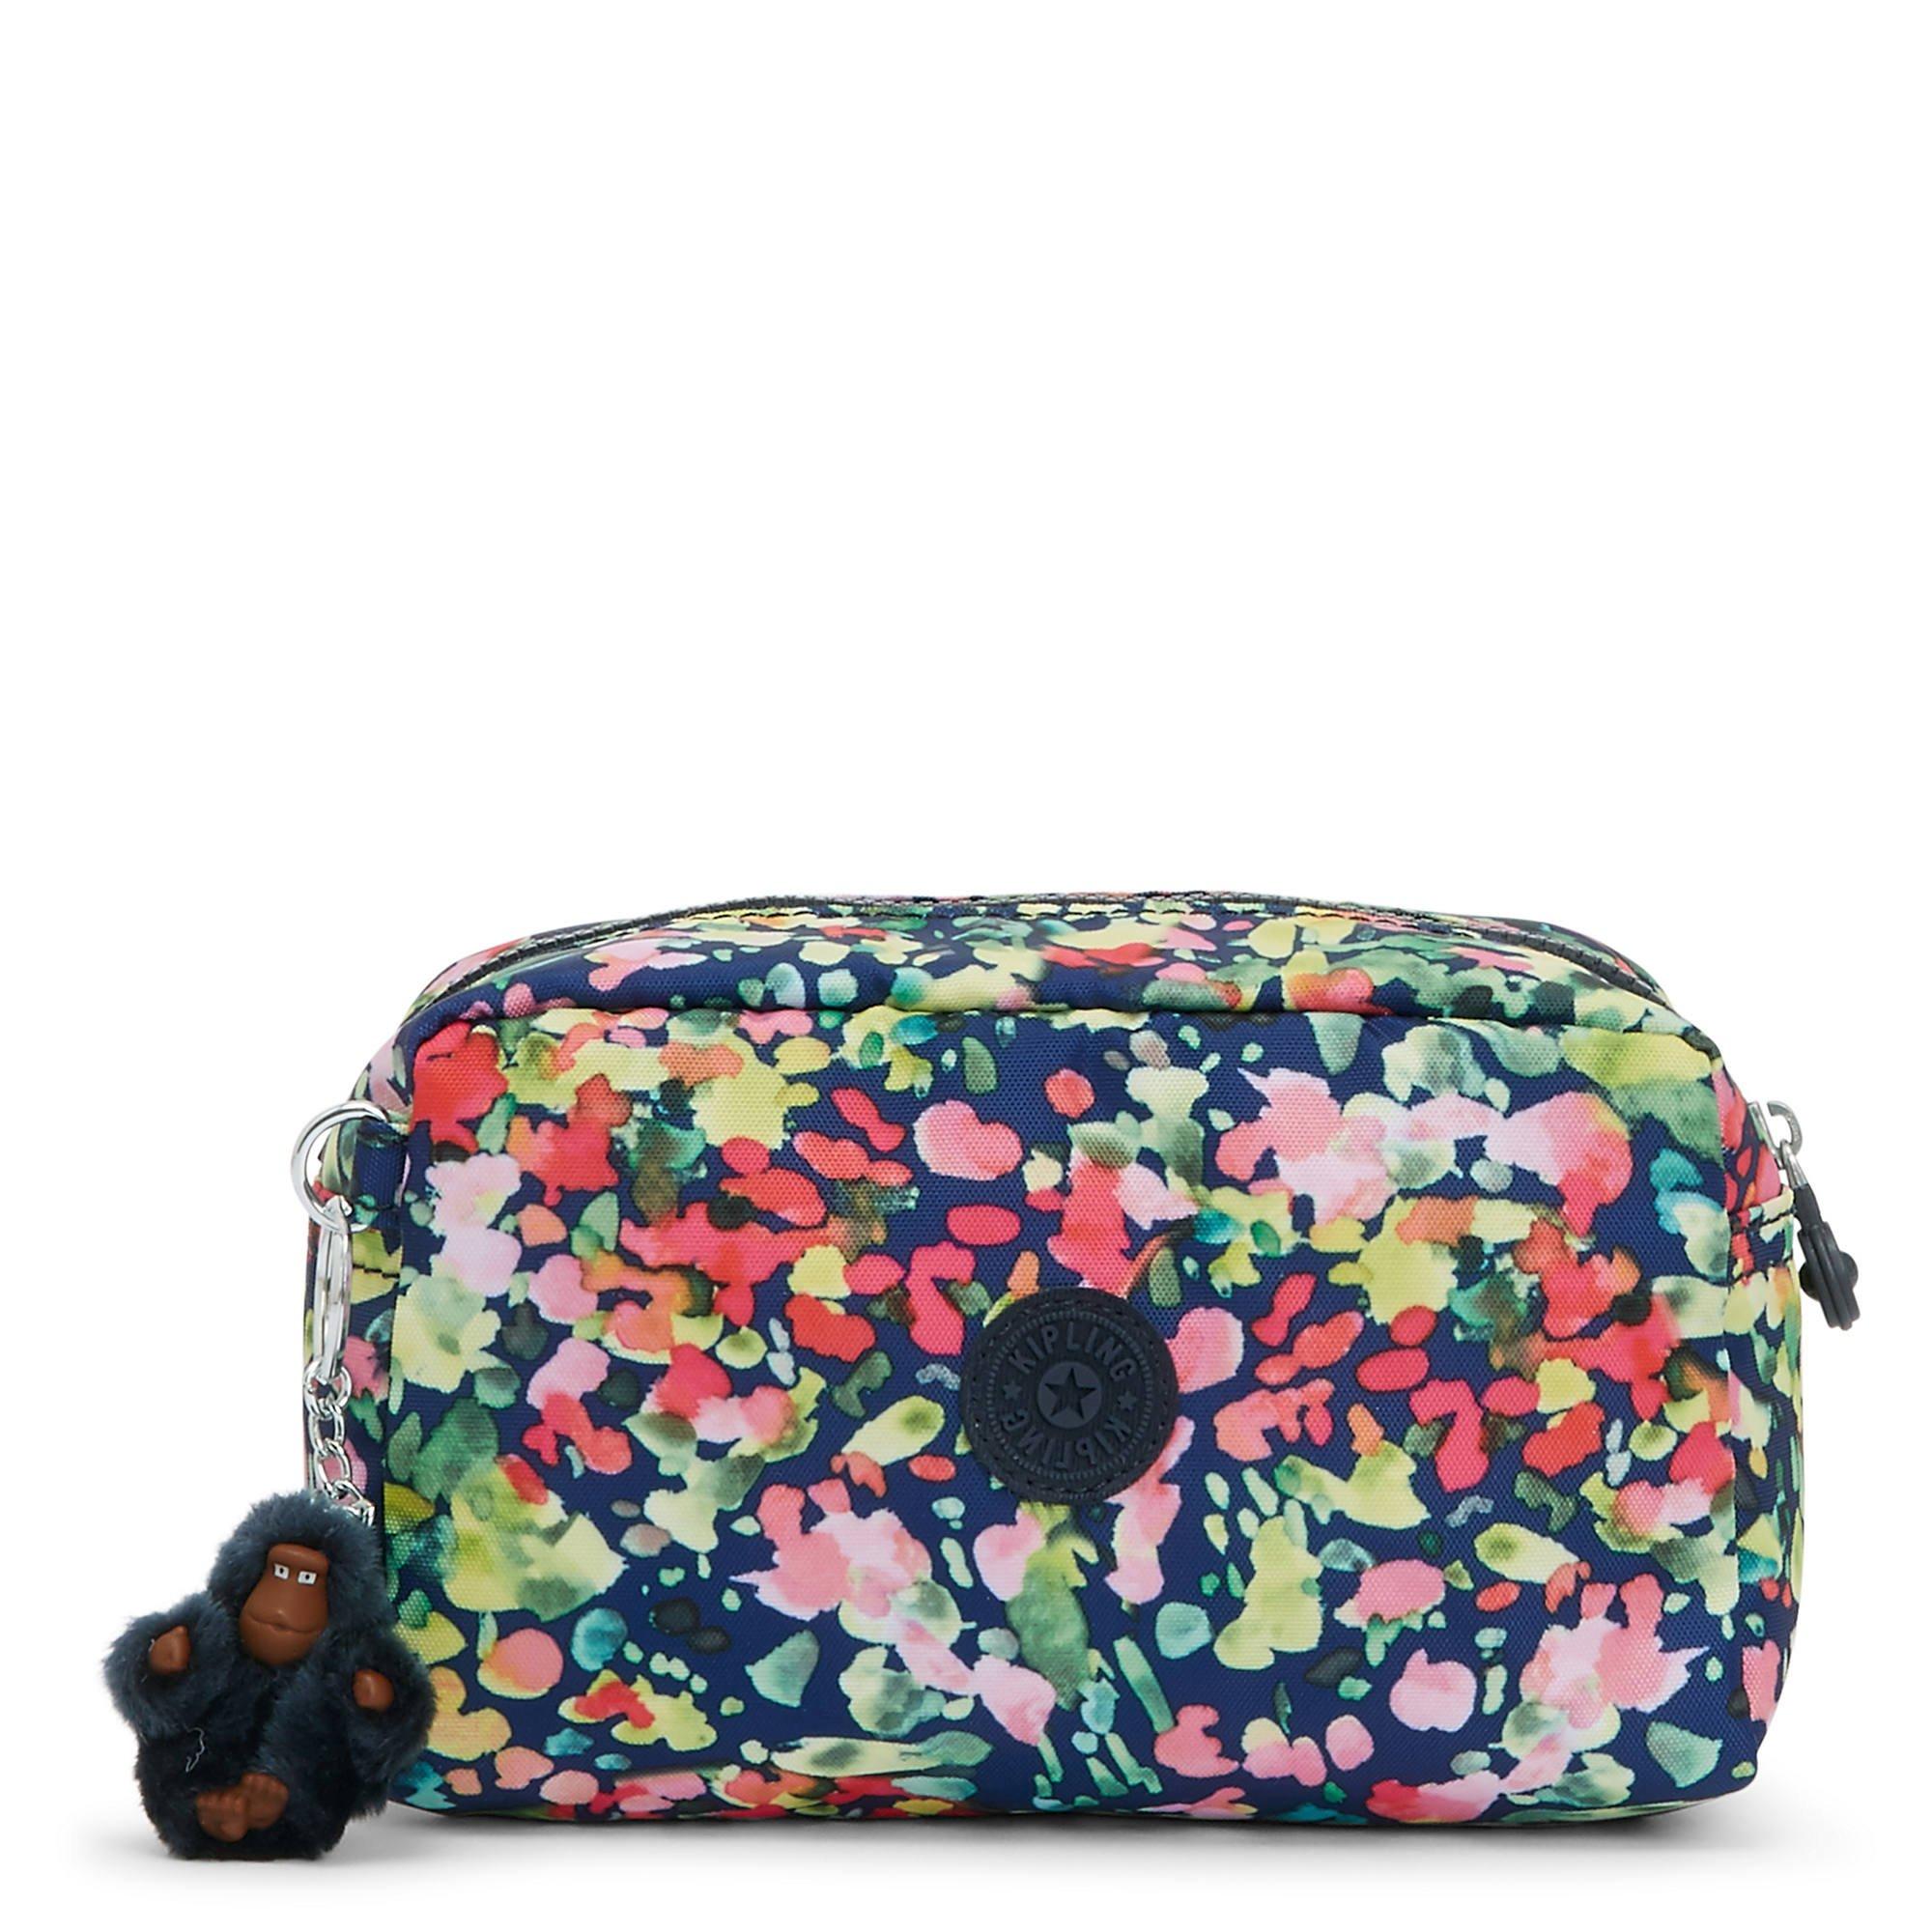 Kipling Women's Gleam Printed Pouch One Size Sweet Bouquet